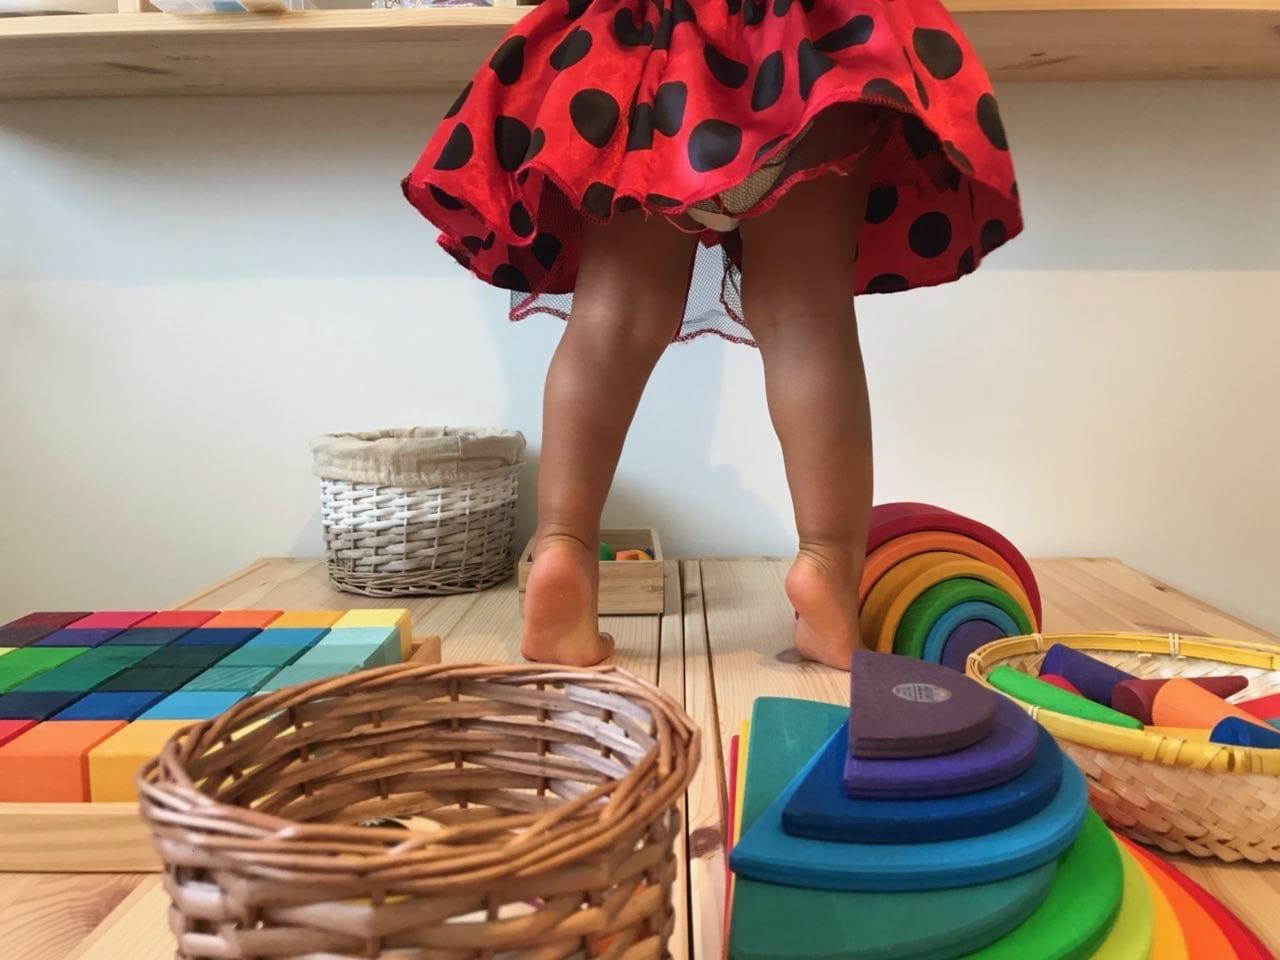 brinquedos para meninas de 2 anos